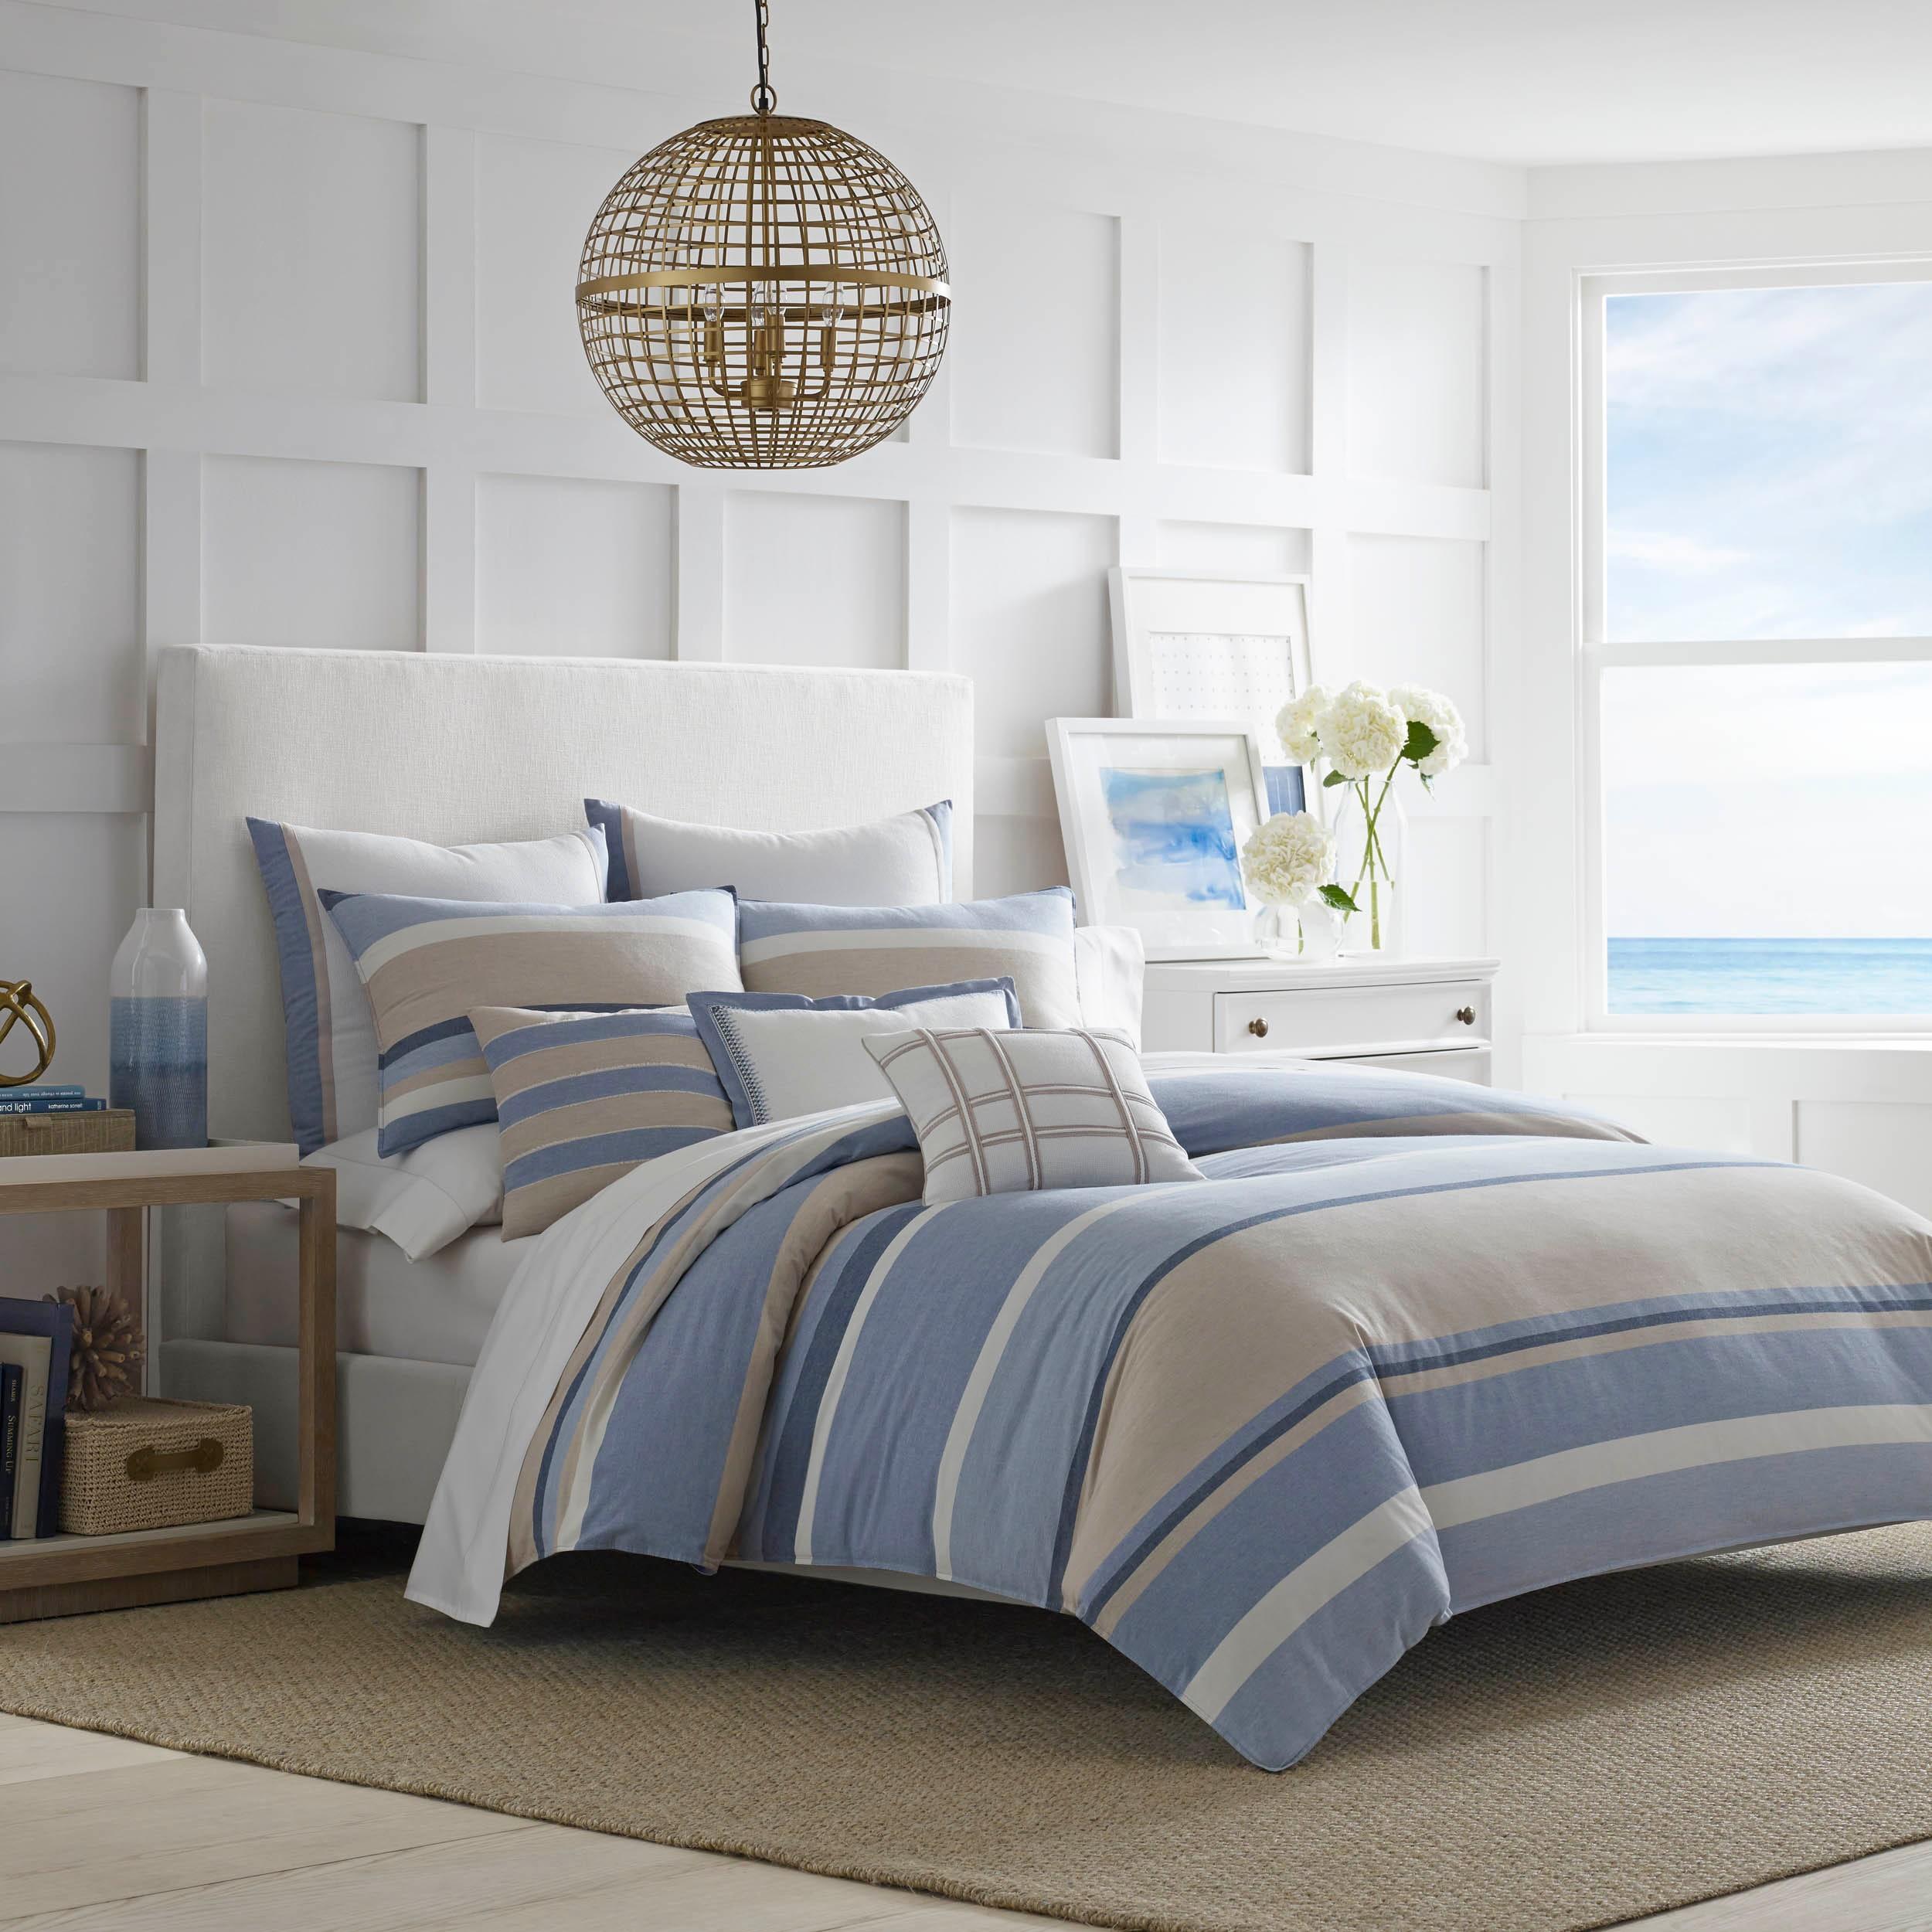 set sets mouse ocean coastal bedding minnie queen bed nautical comforter